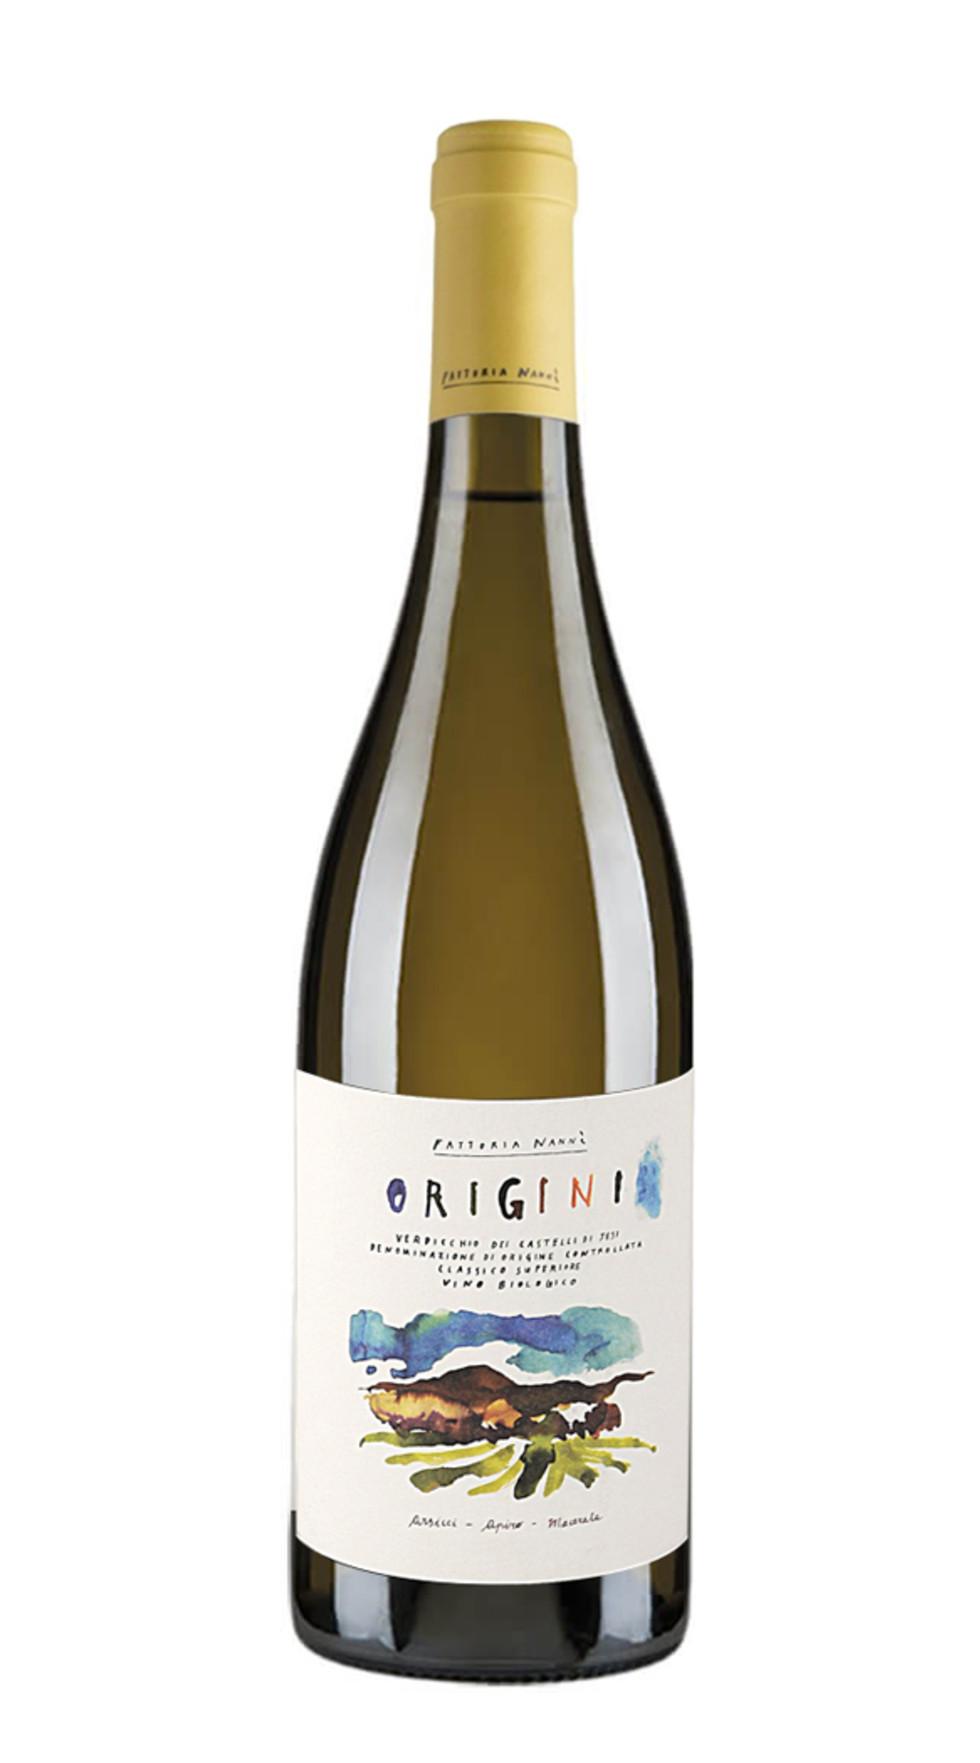 Vino bianco Origini Verdicchio dei Castelli di Jesi Classico Superiore